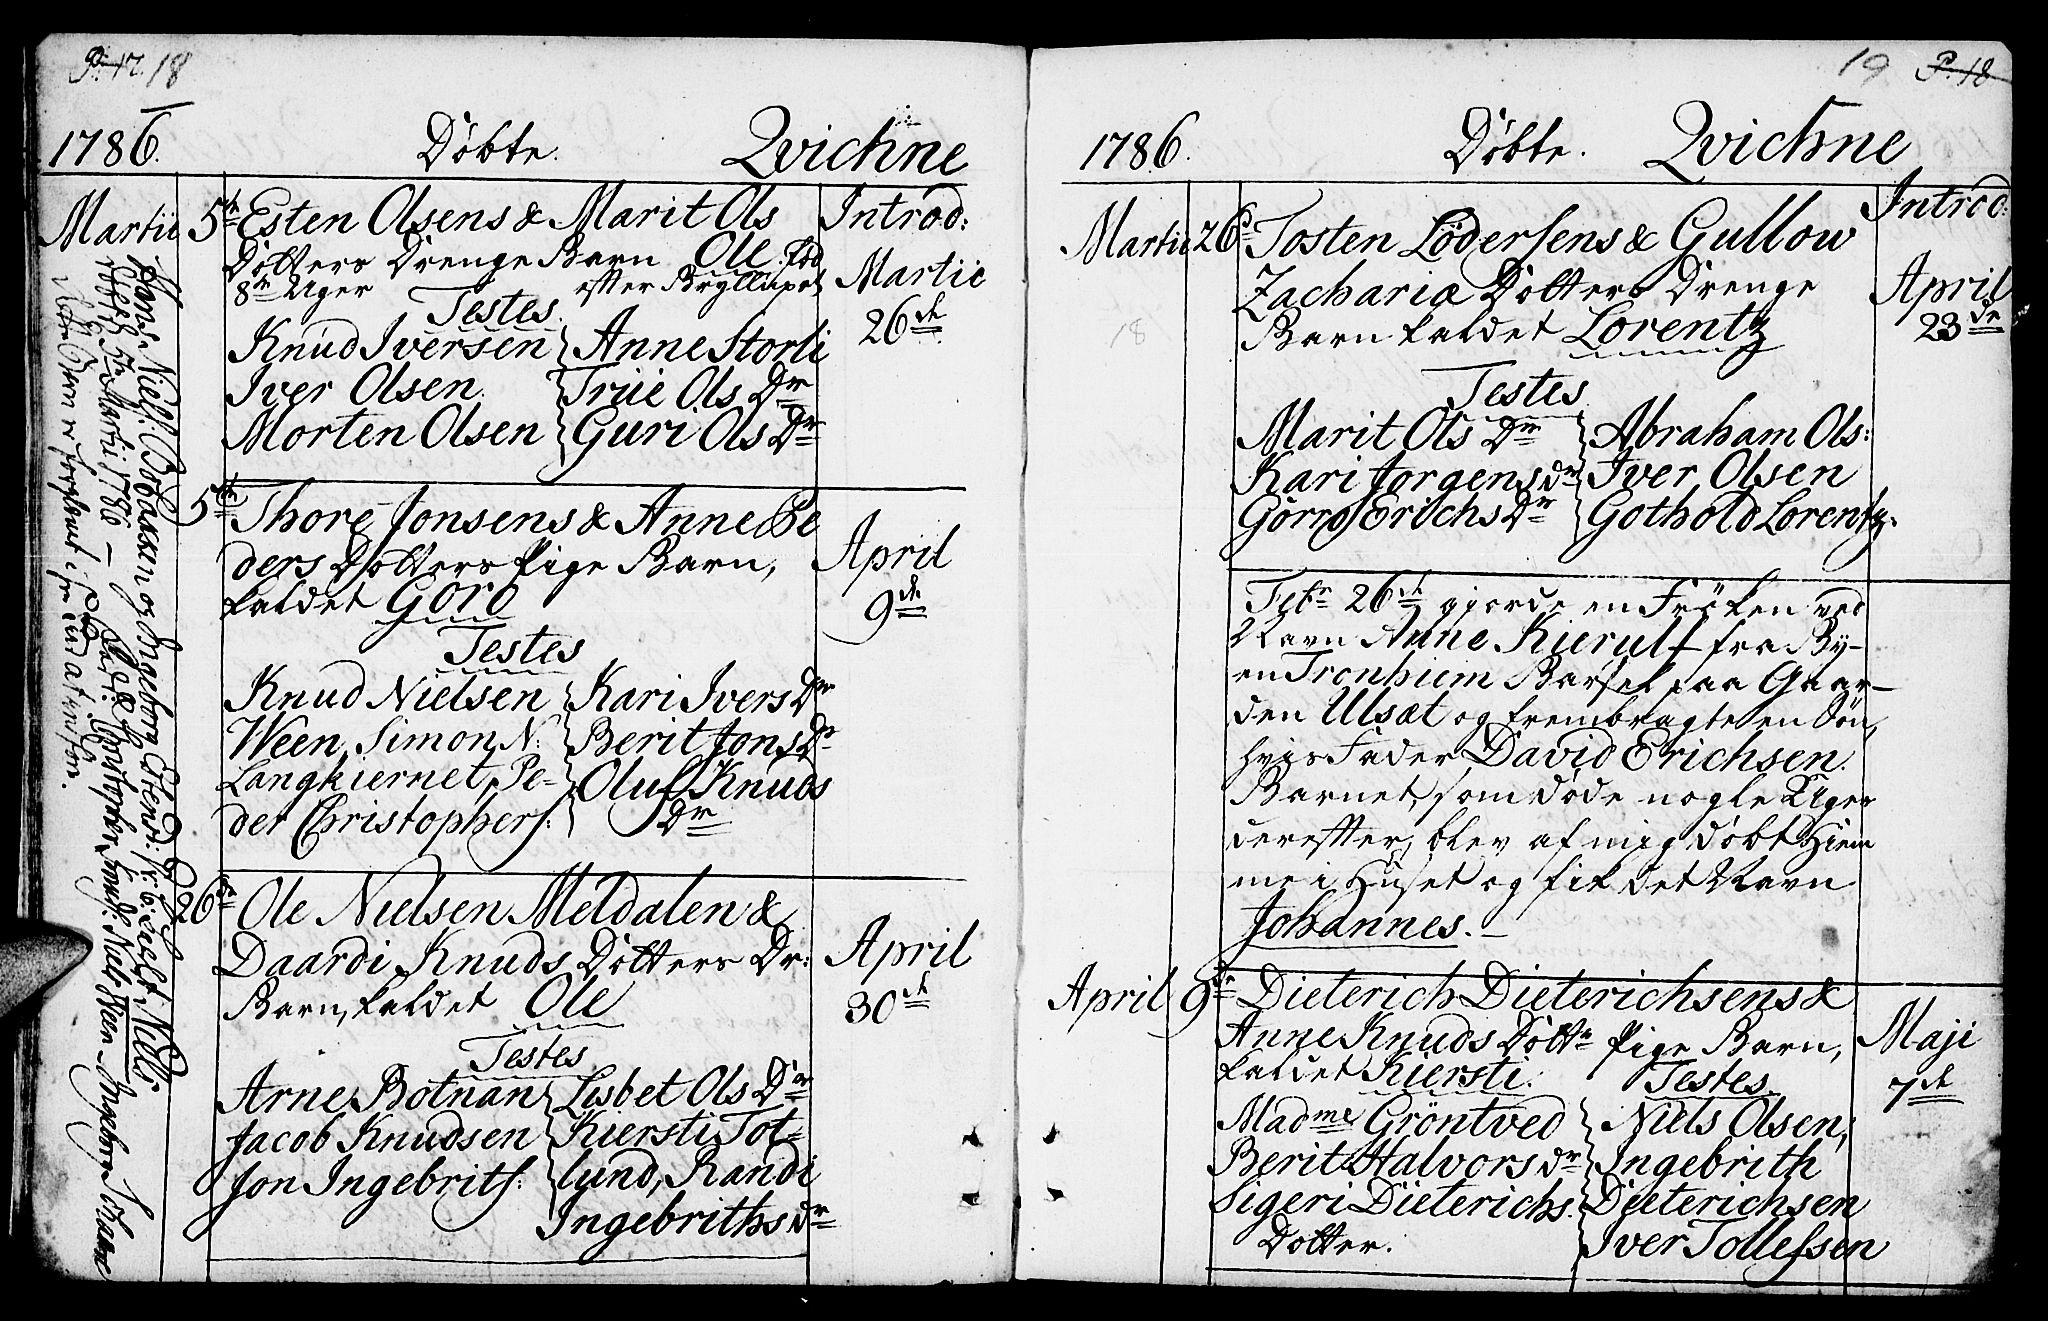 SAH, Kvikne prestekontor, Ministerialbok nr. 3, 1785-1814, s. 18-19